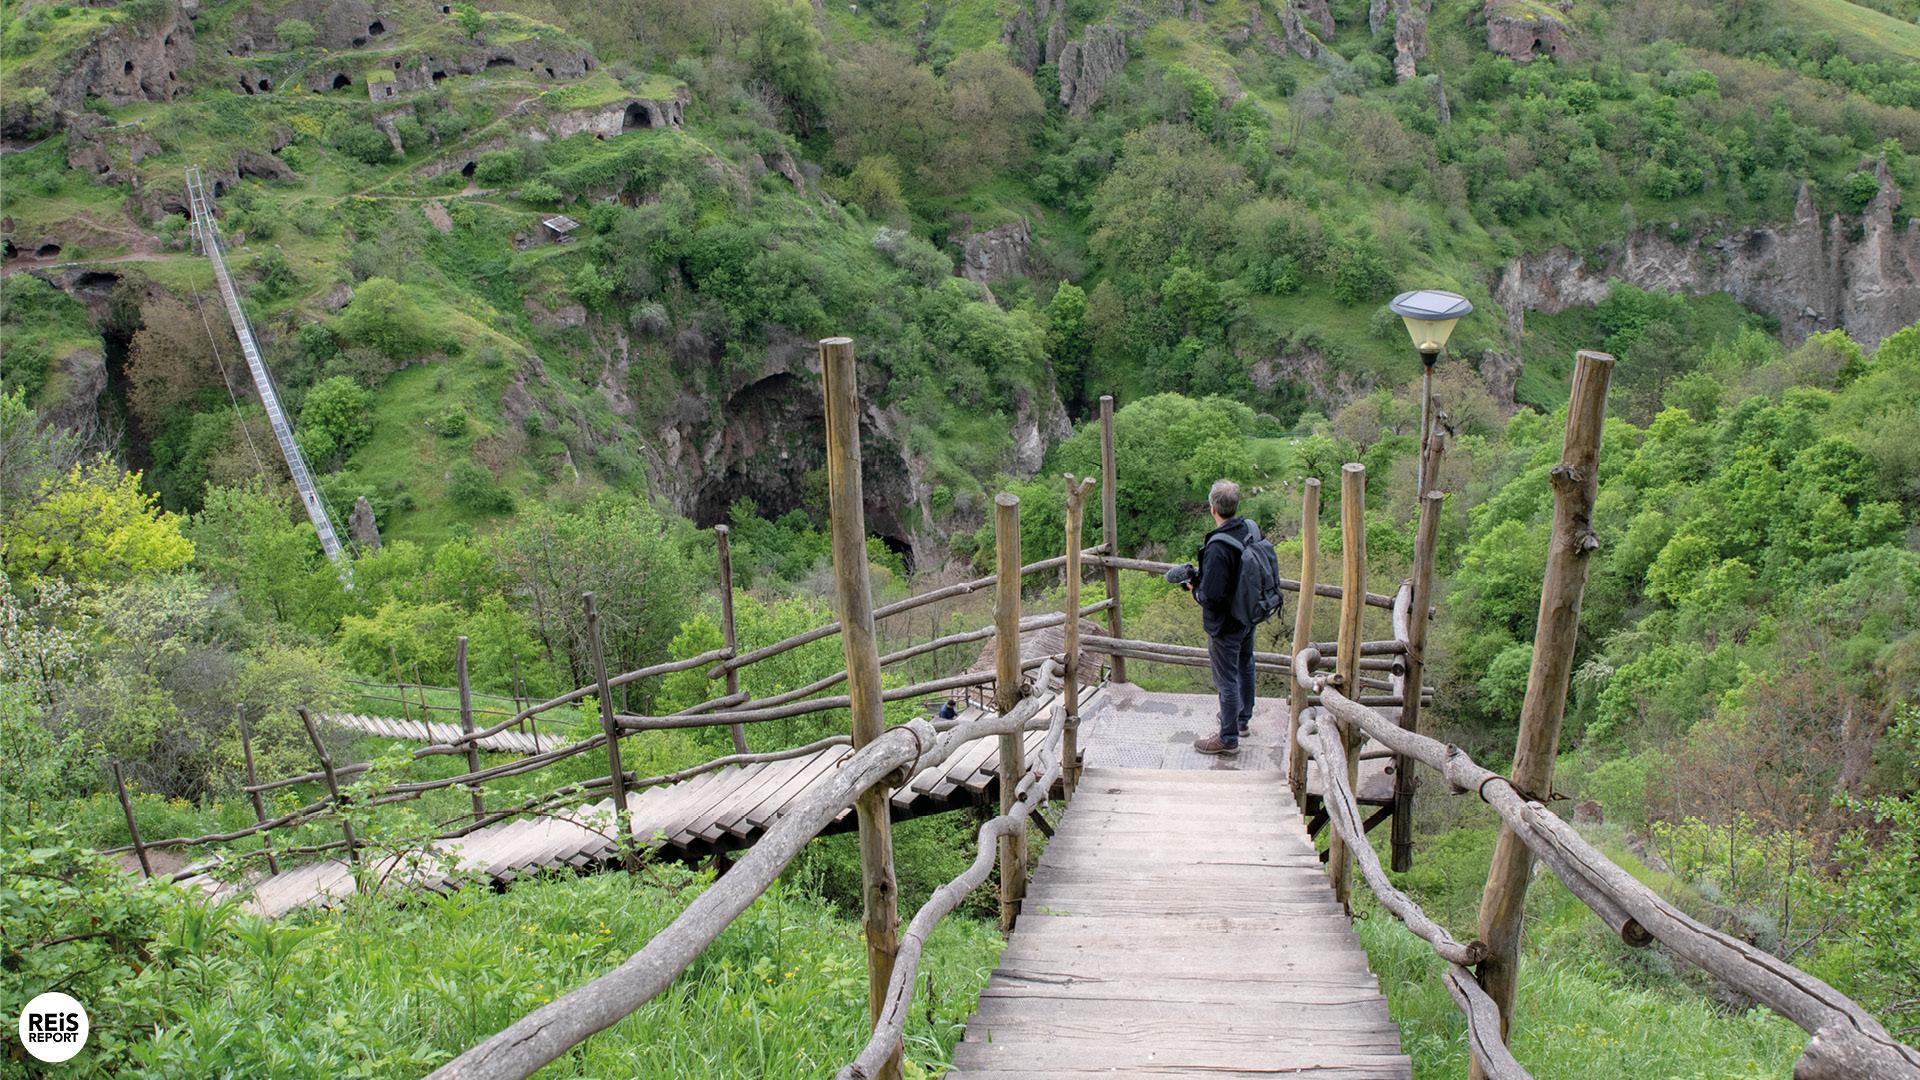 khndzoresk-armenie